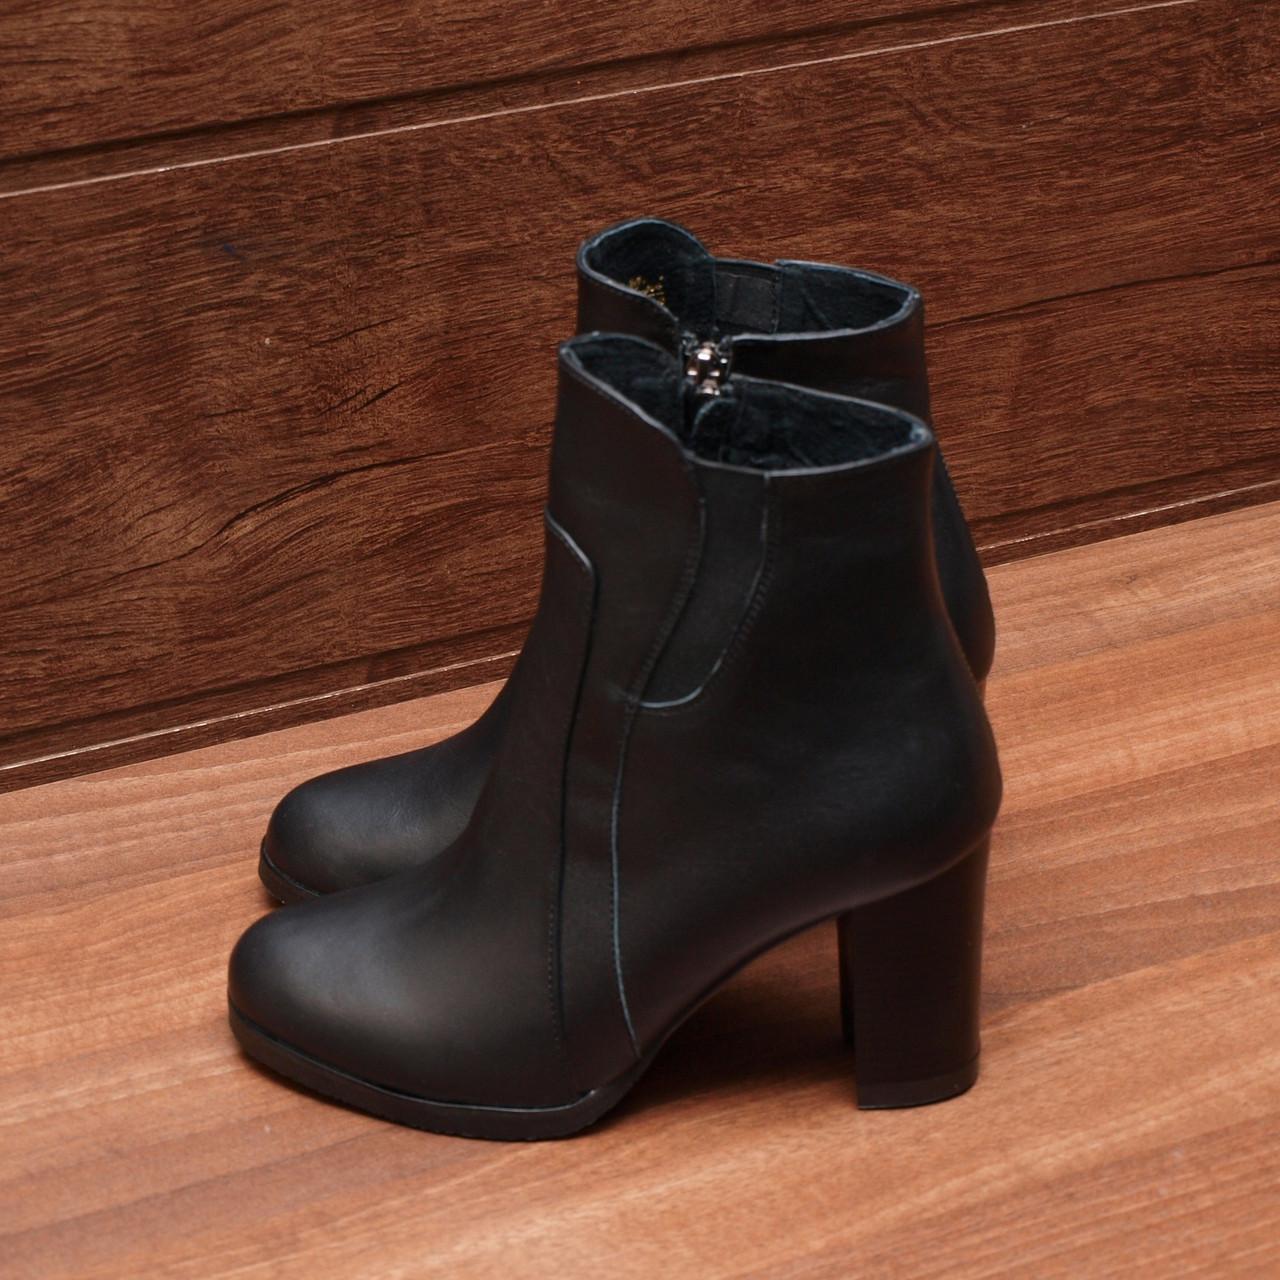 Женские ботинки 18328.01 «YDG-Bellini» 36